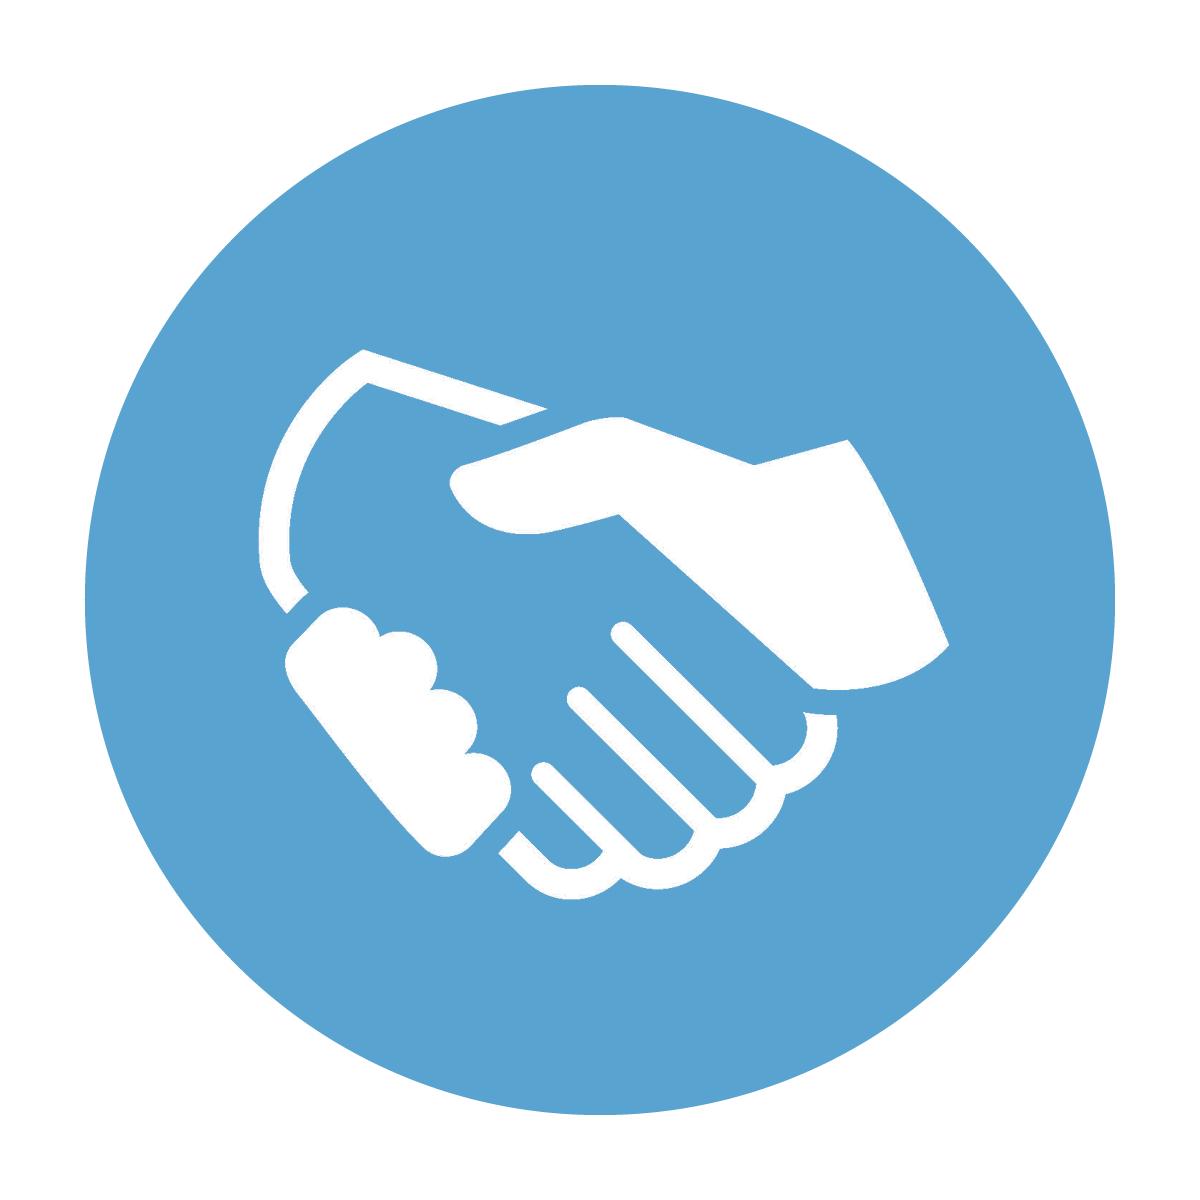 Handshake Icon_light blue.jpg